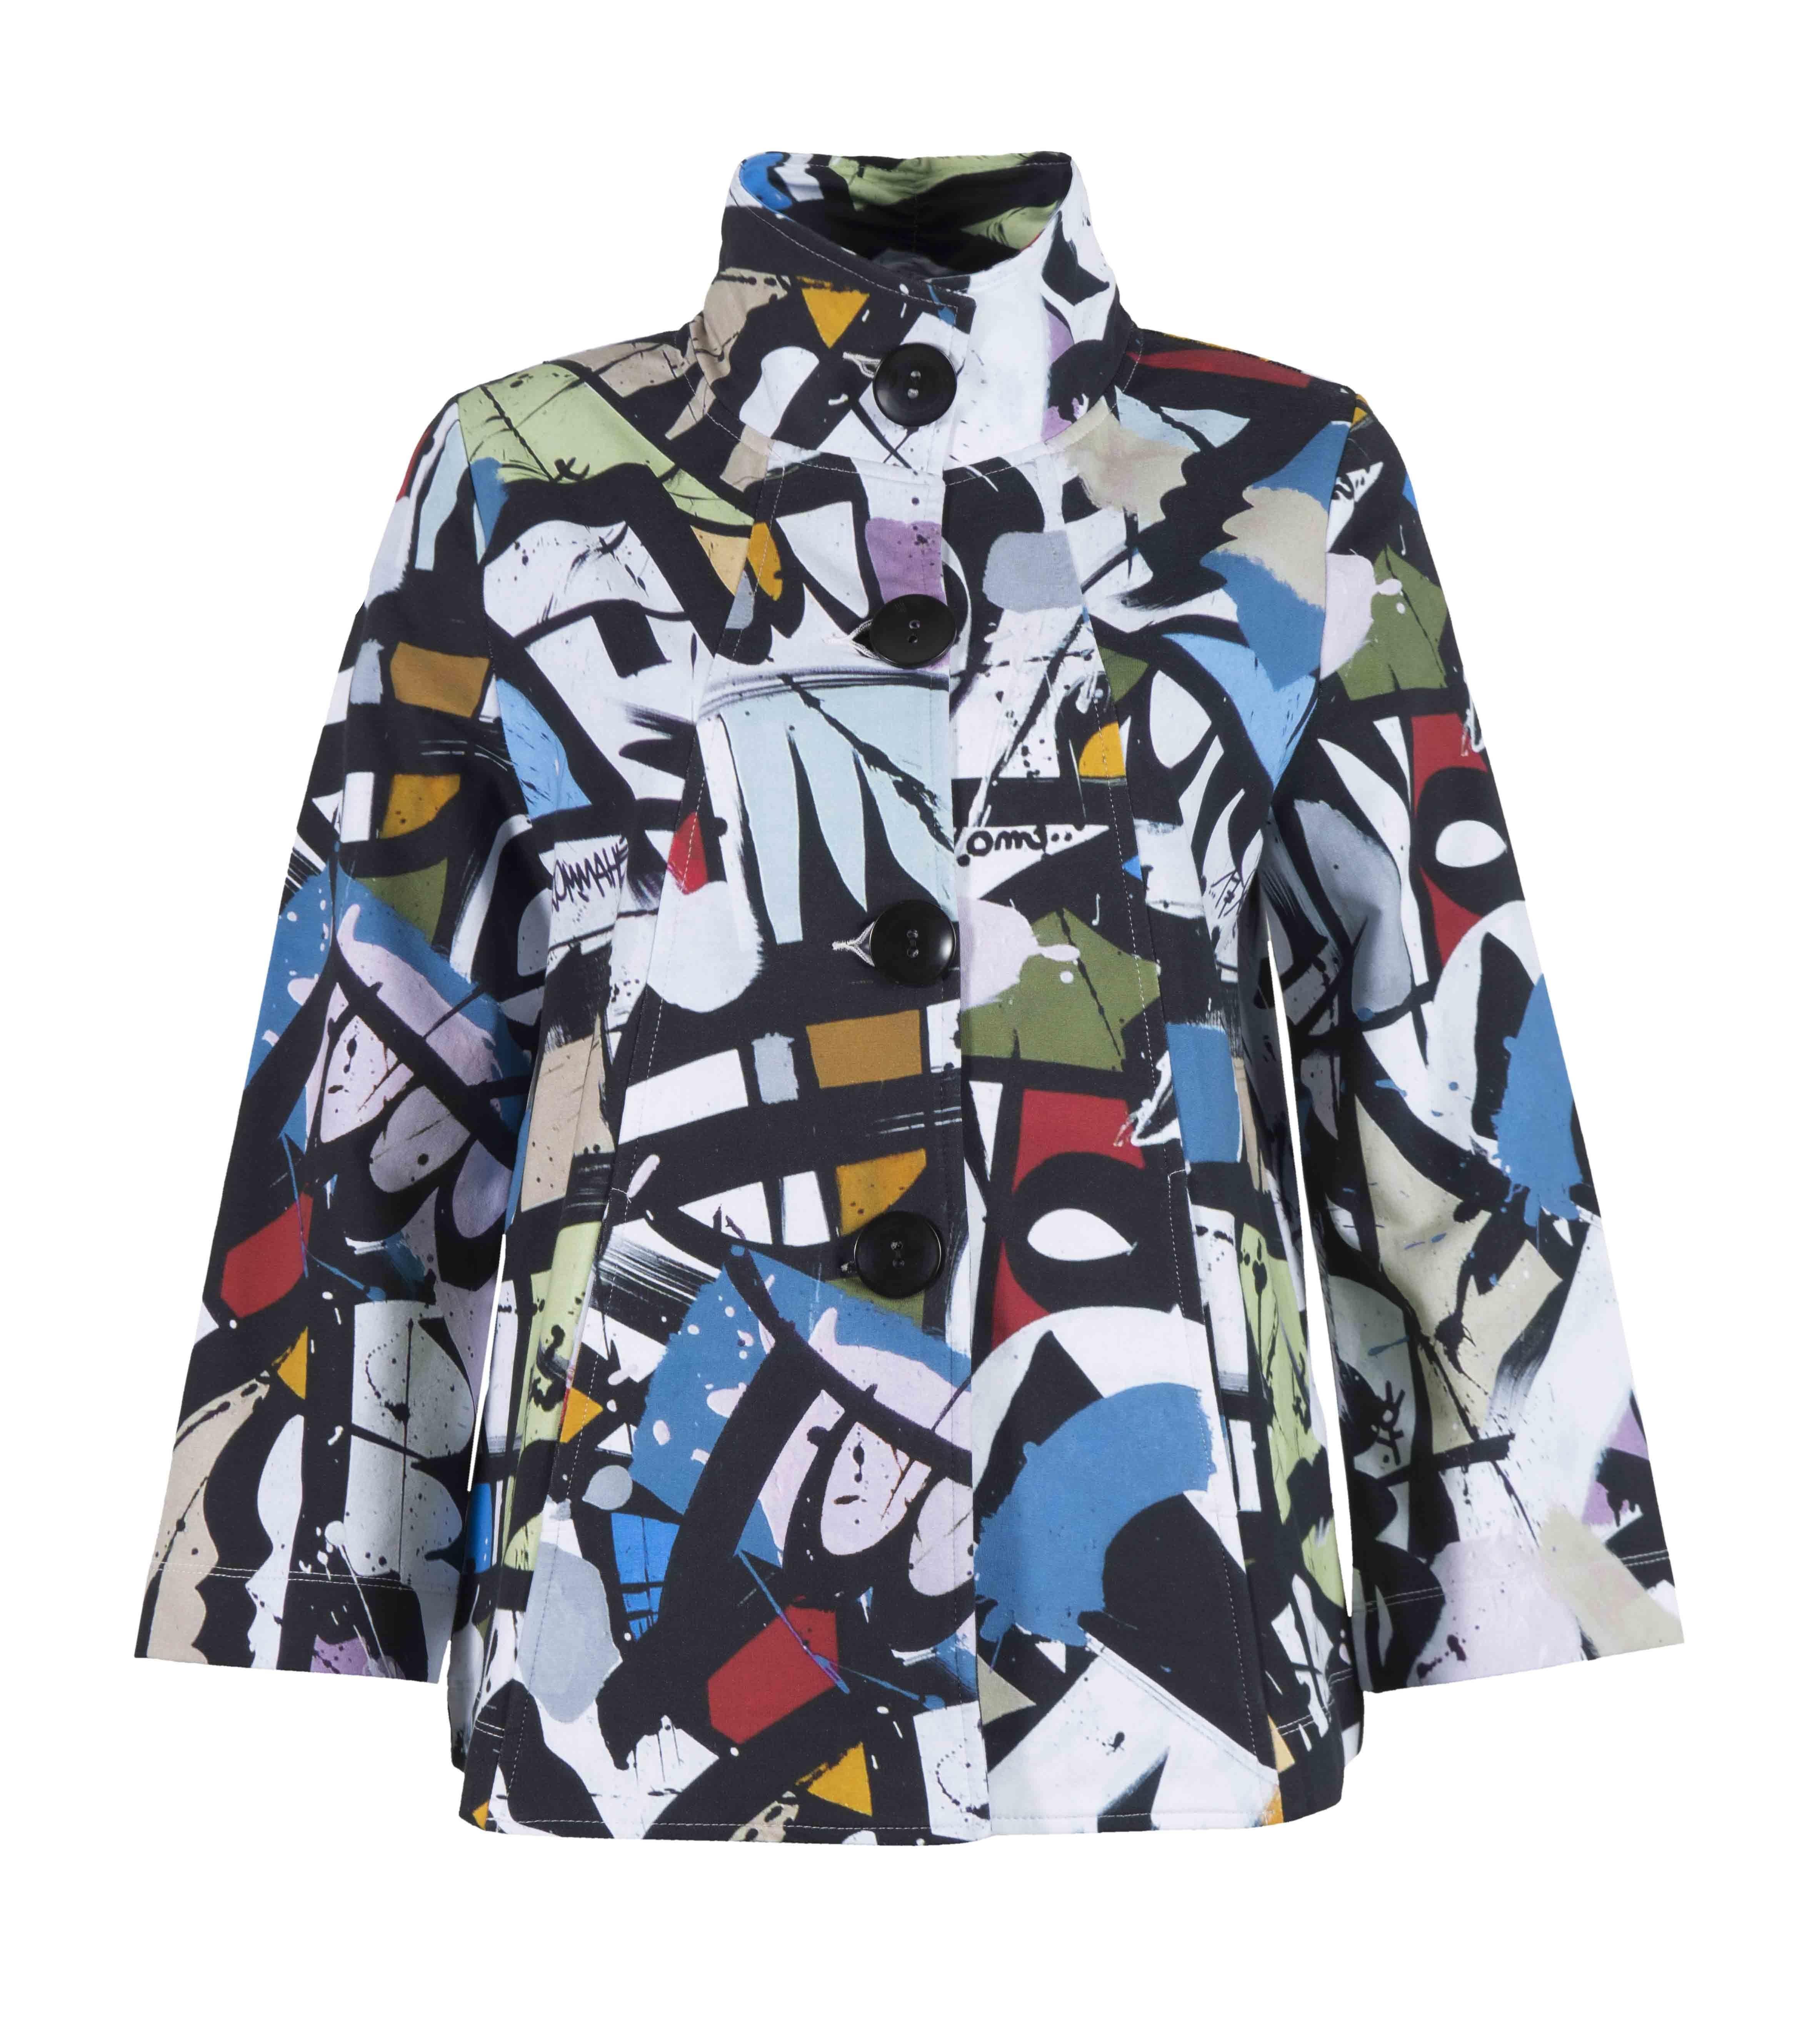 Simply Art Dolcezza: Gorgeous Graffiti Art Knit Cardigan Jacket (2 Left!)